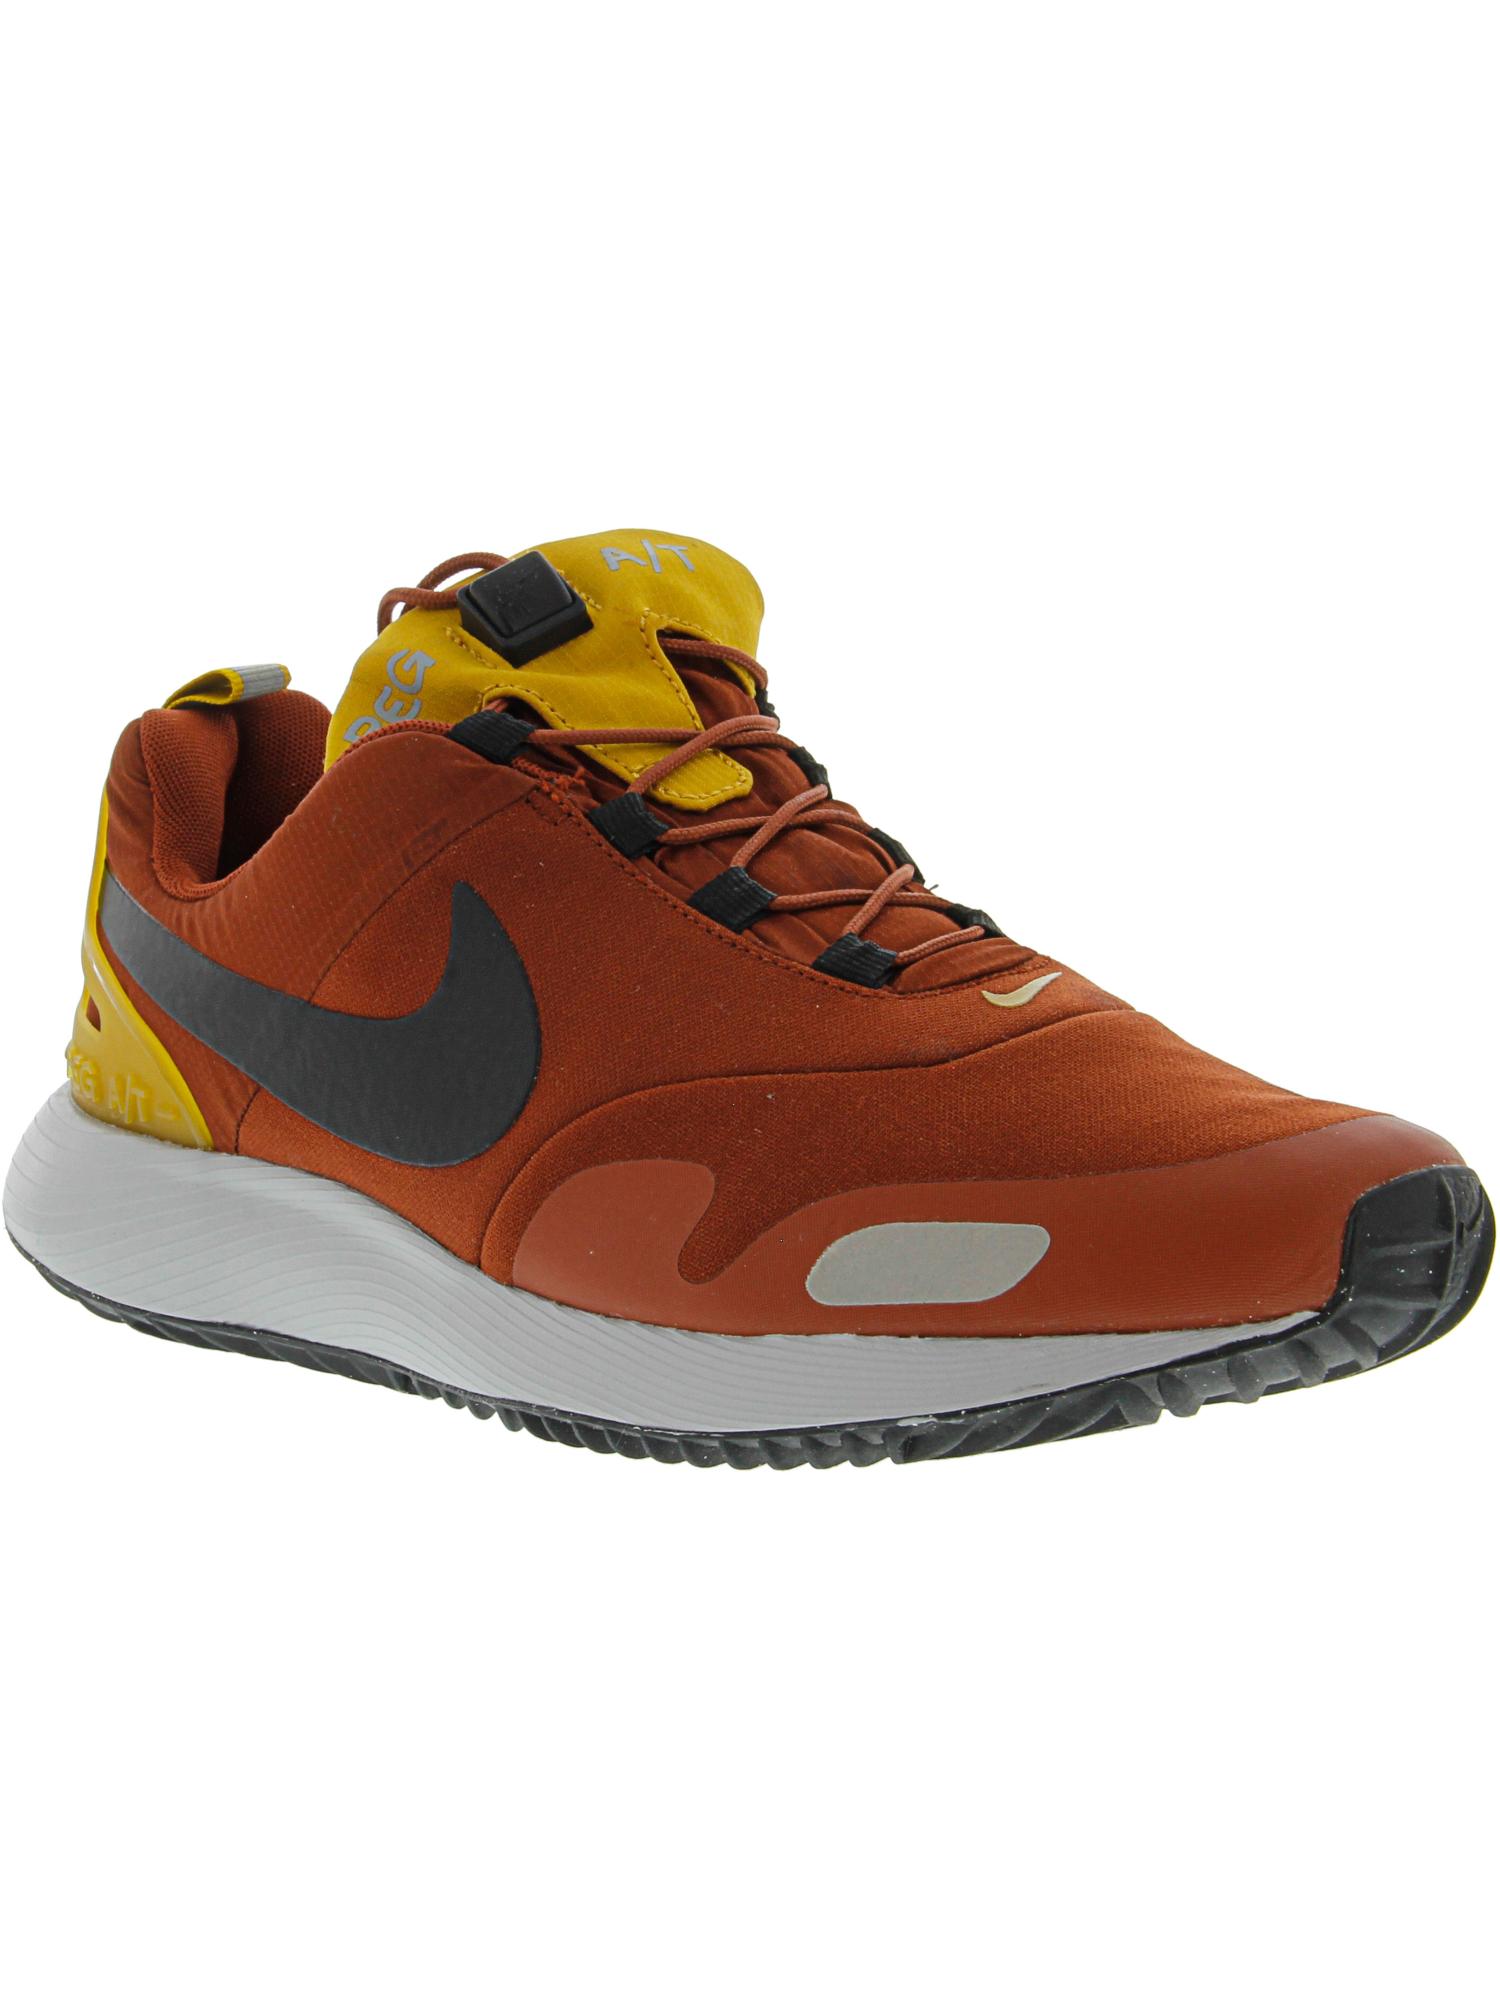 e5e1d8da5391 Nike Air Pegasus A t Trail Running Shoes Size 12 Mars Stone Black ...